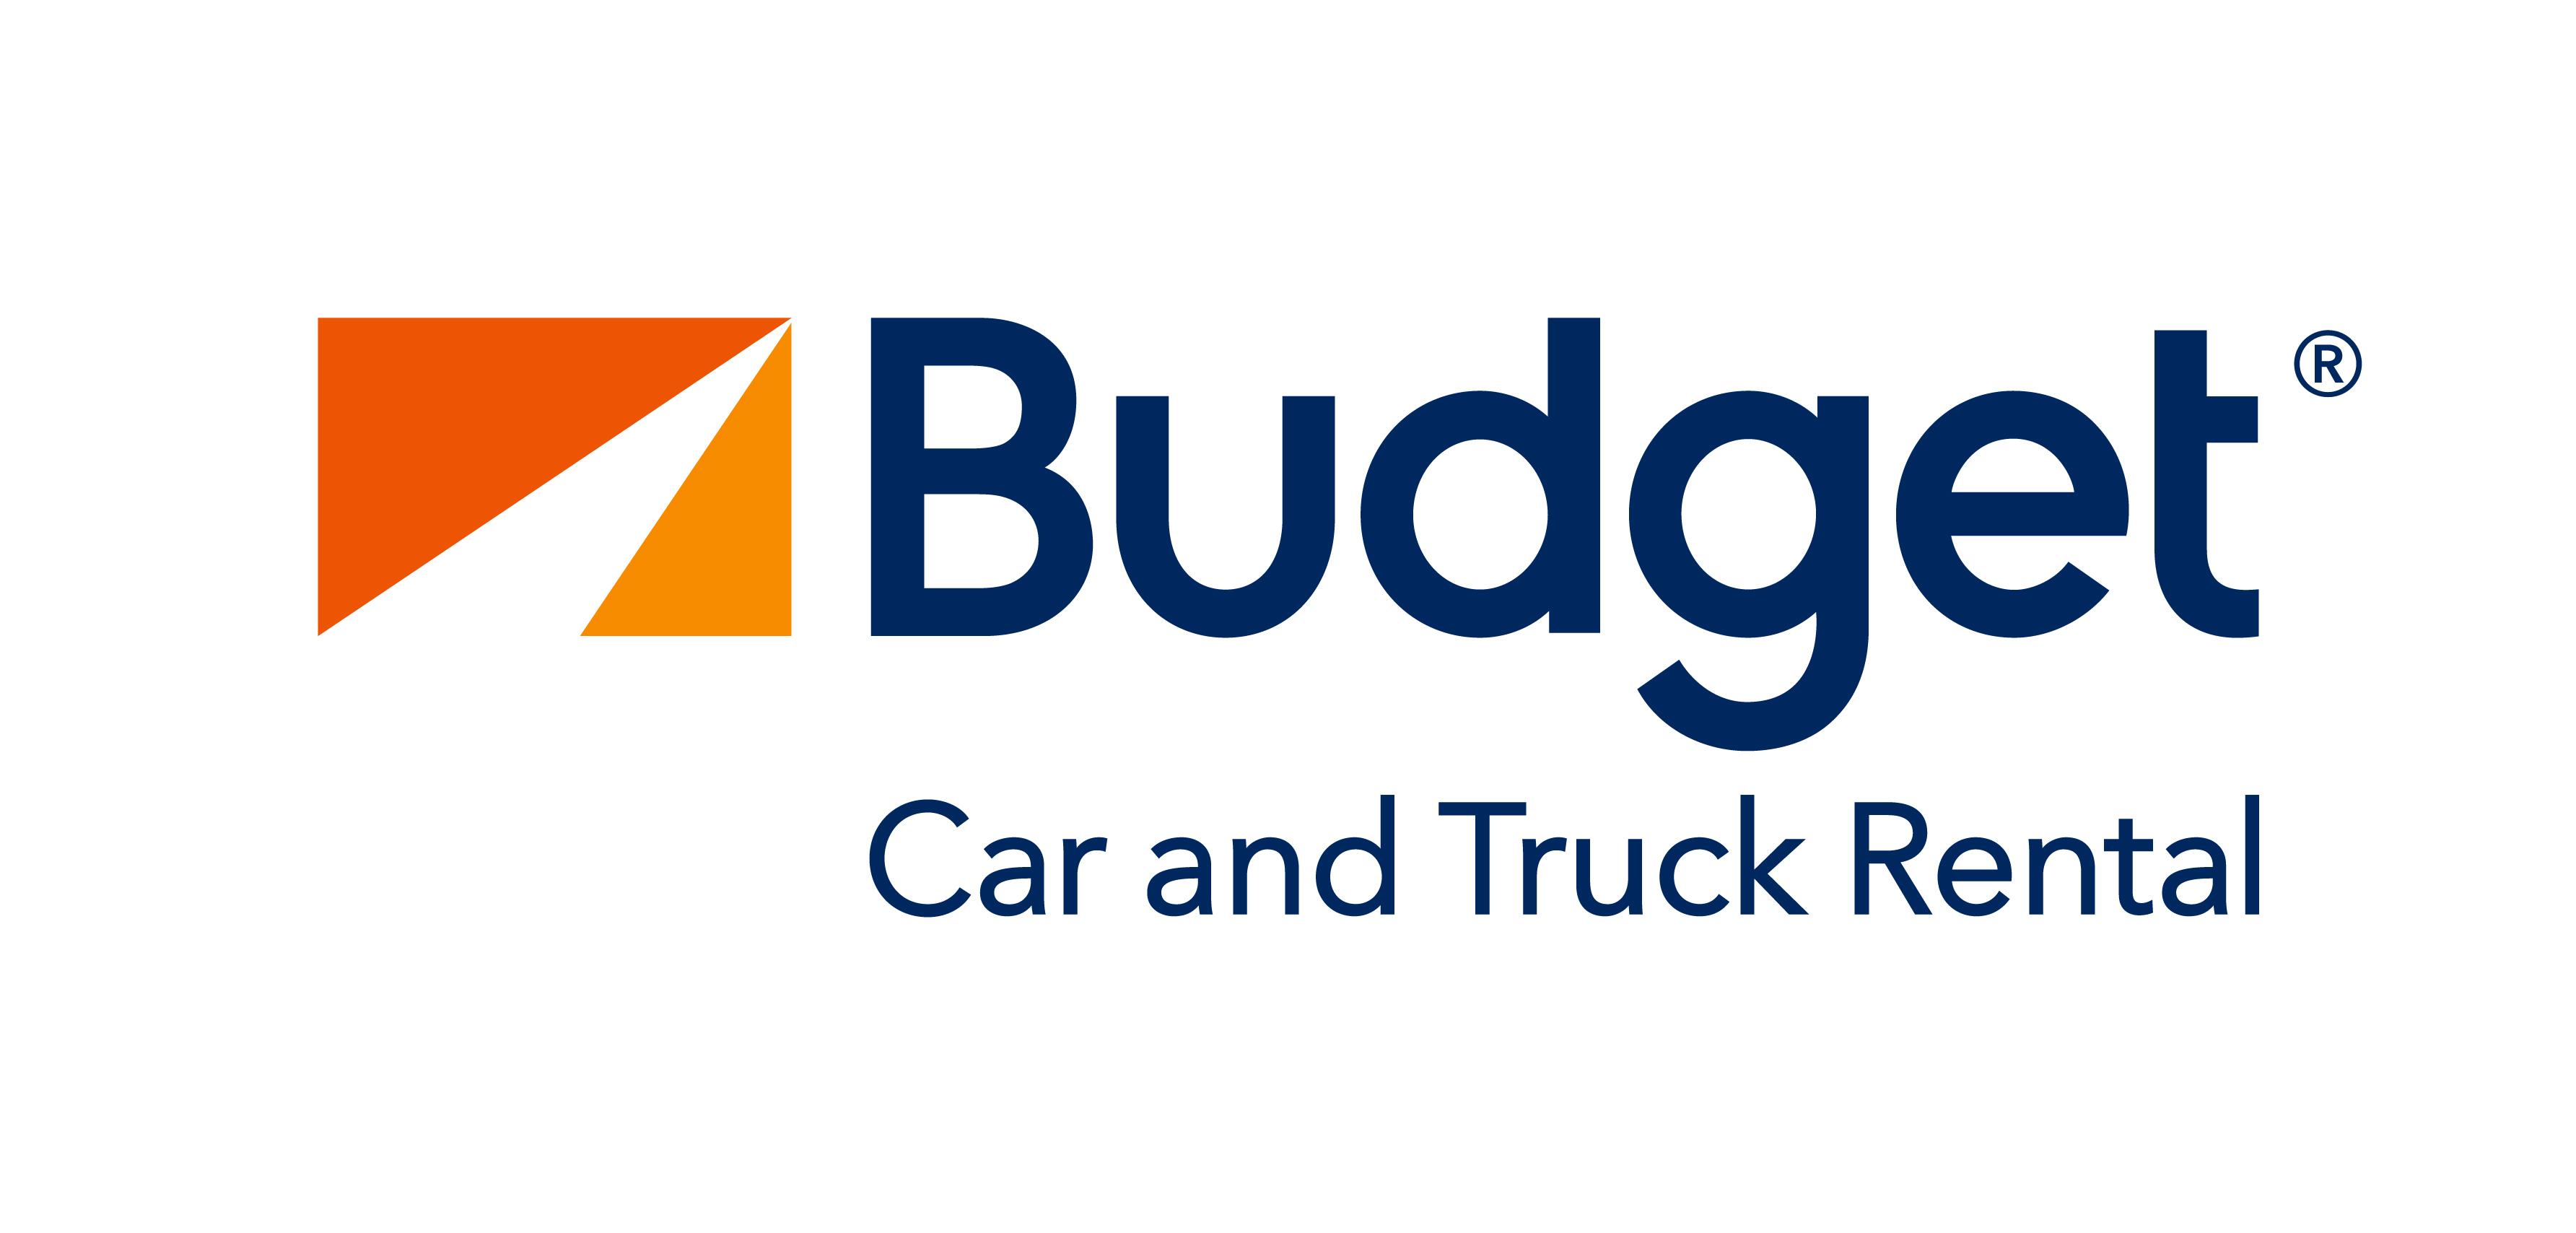 Budget Car & Truck Rental Salisbury - Salisbury Plain, SA 5109 - (08) 8283 3555 | ShowMeLocal.com